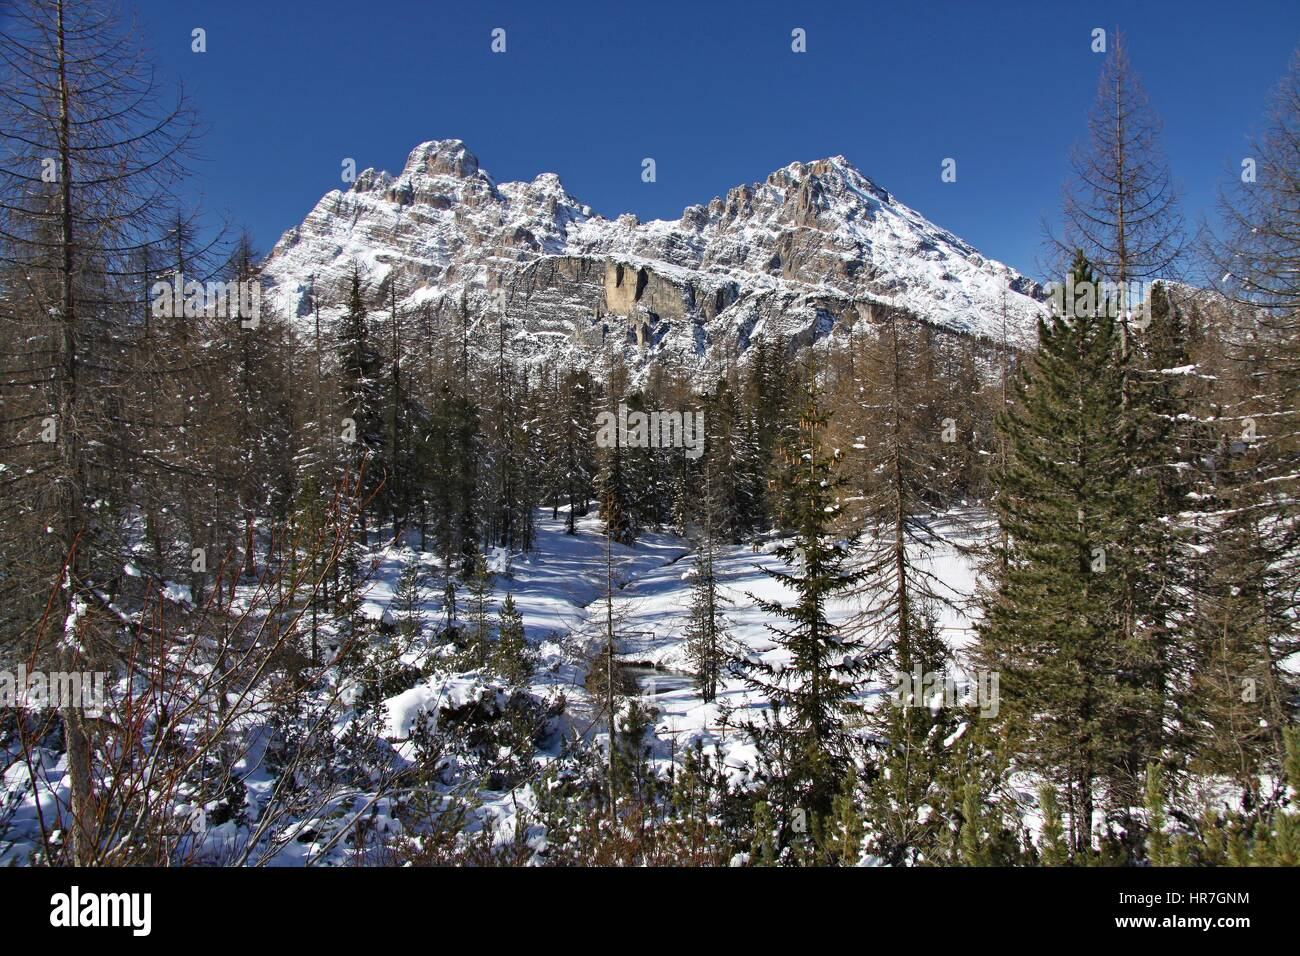 Dolomiten im Winter, Blick vom Wandern Trail Ciadin Della Neve, Italien-ID Fotografie Z Fotobanky: 585999350 Stockbild